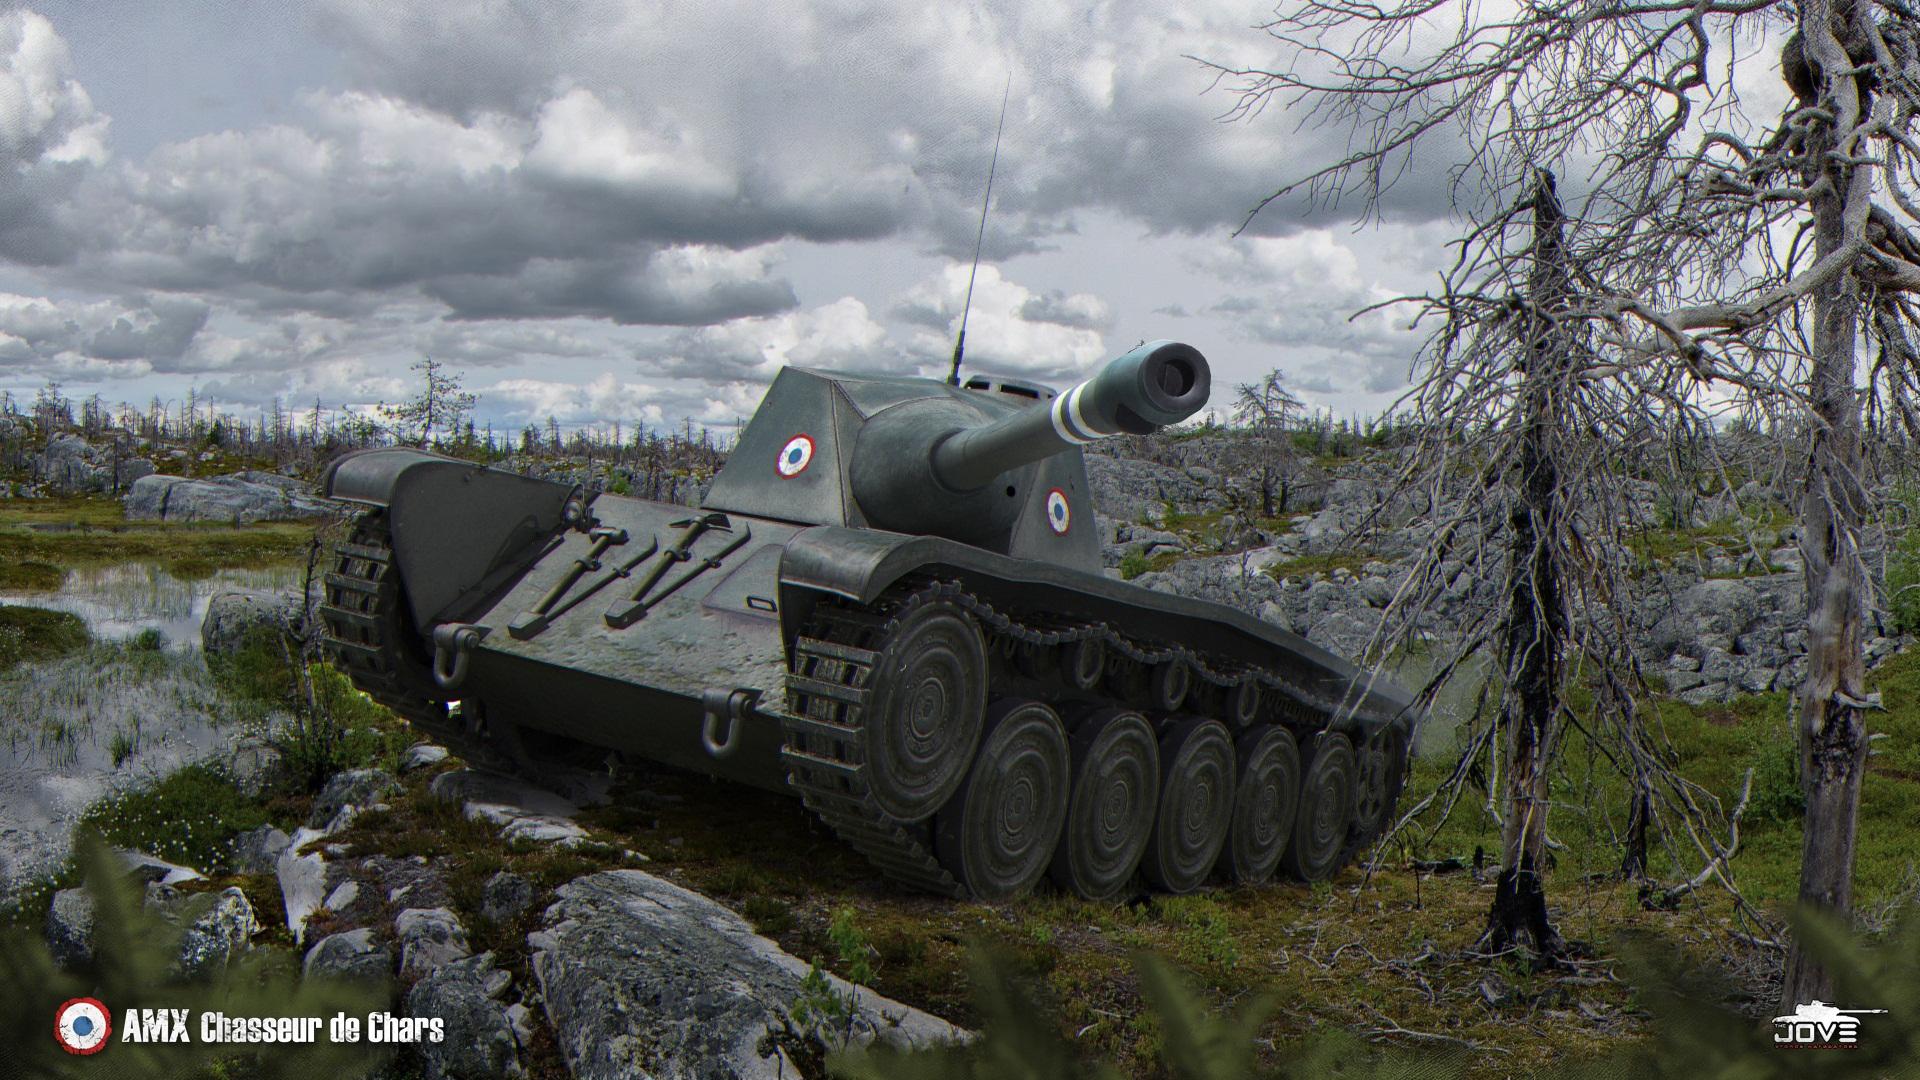 Особенности и преимущества танка AMX chasseur de chars